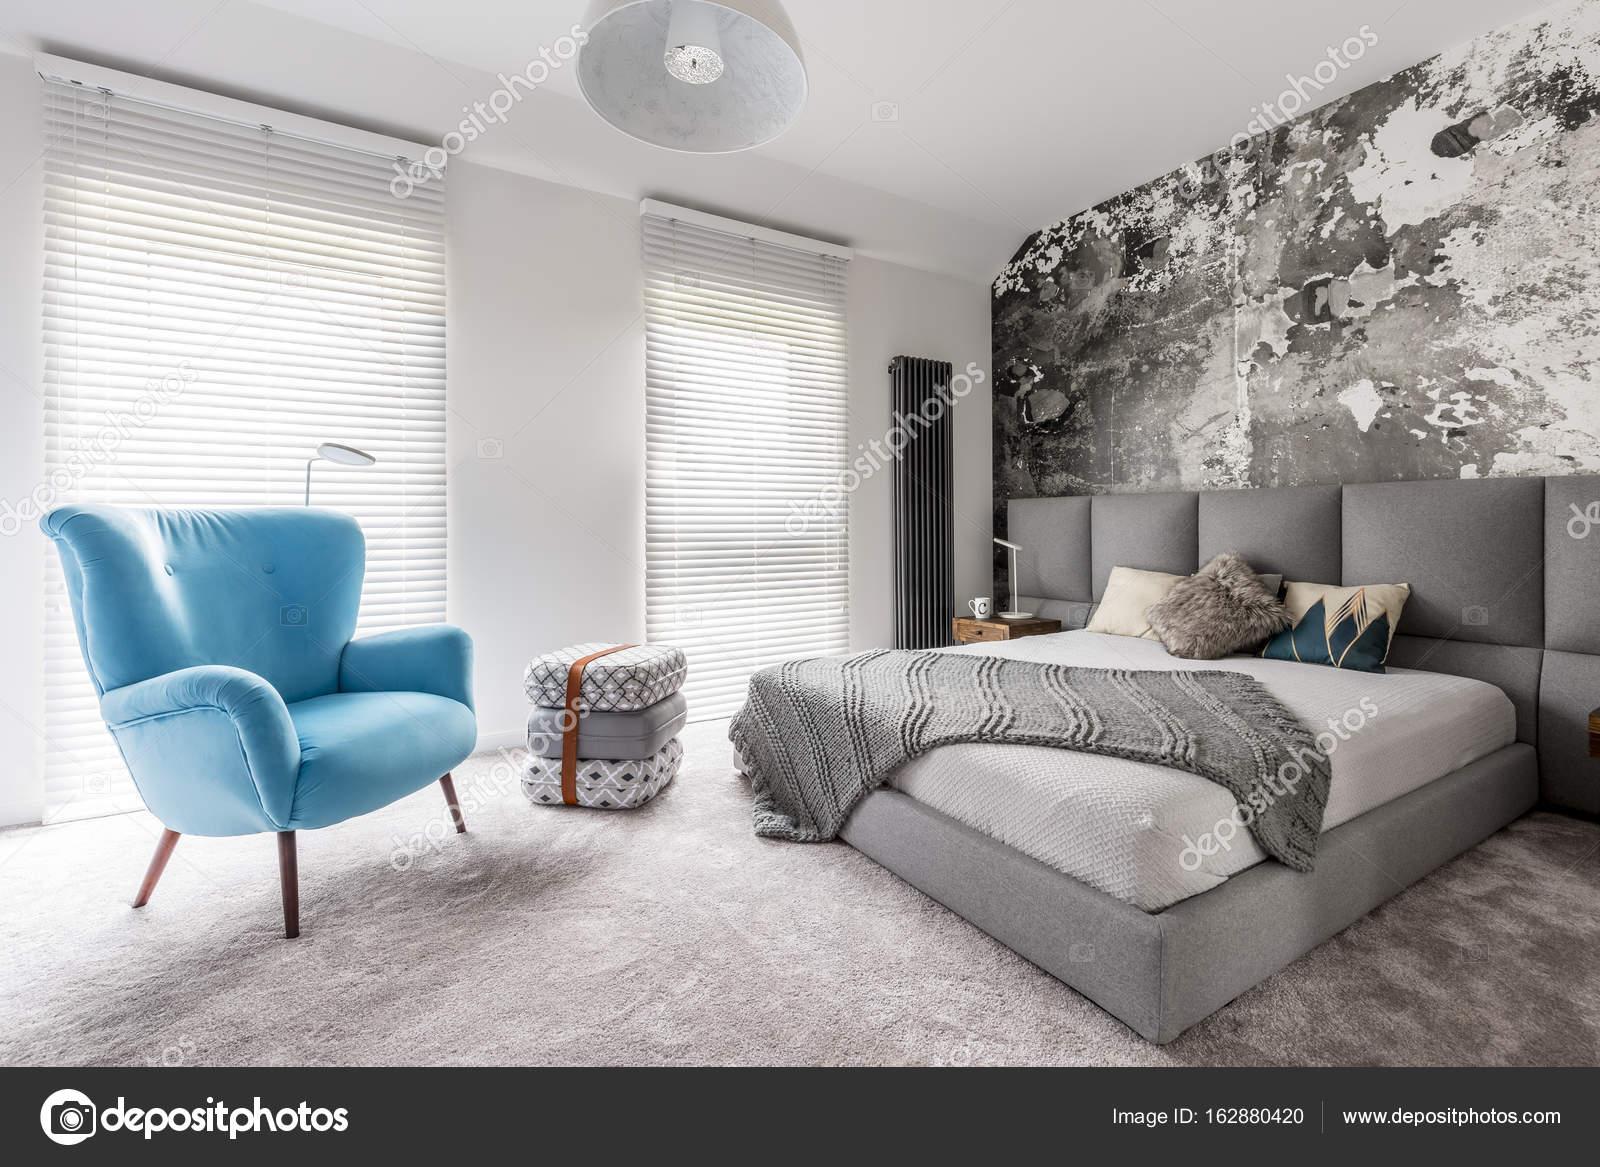 Slaapkamer Vintage Blue : Slaapkamer met vintage blauwe leunstoel u2014 stockfoto © photographee